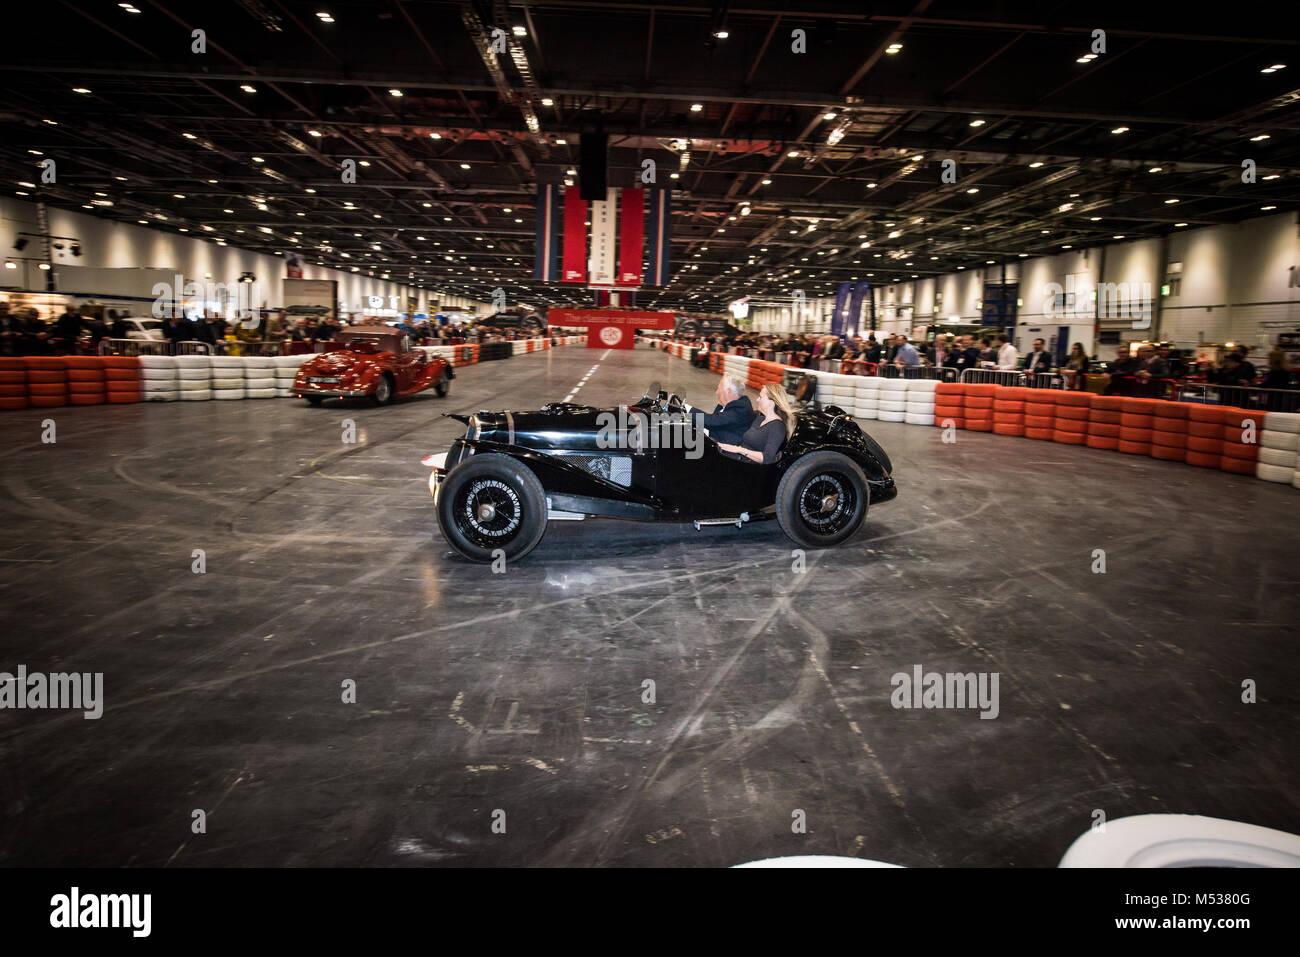 1934 Lancia Astura driving demonstration at The London Classic Car Show & Historic Motorsport International - Stock Image